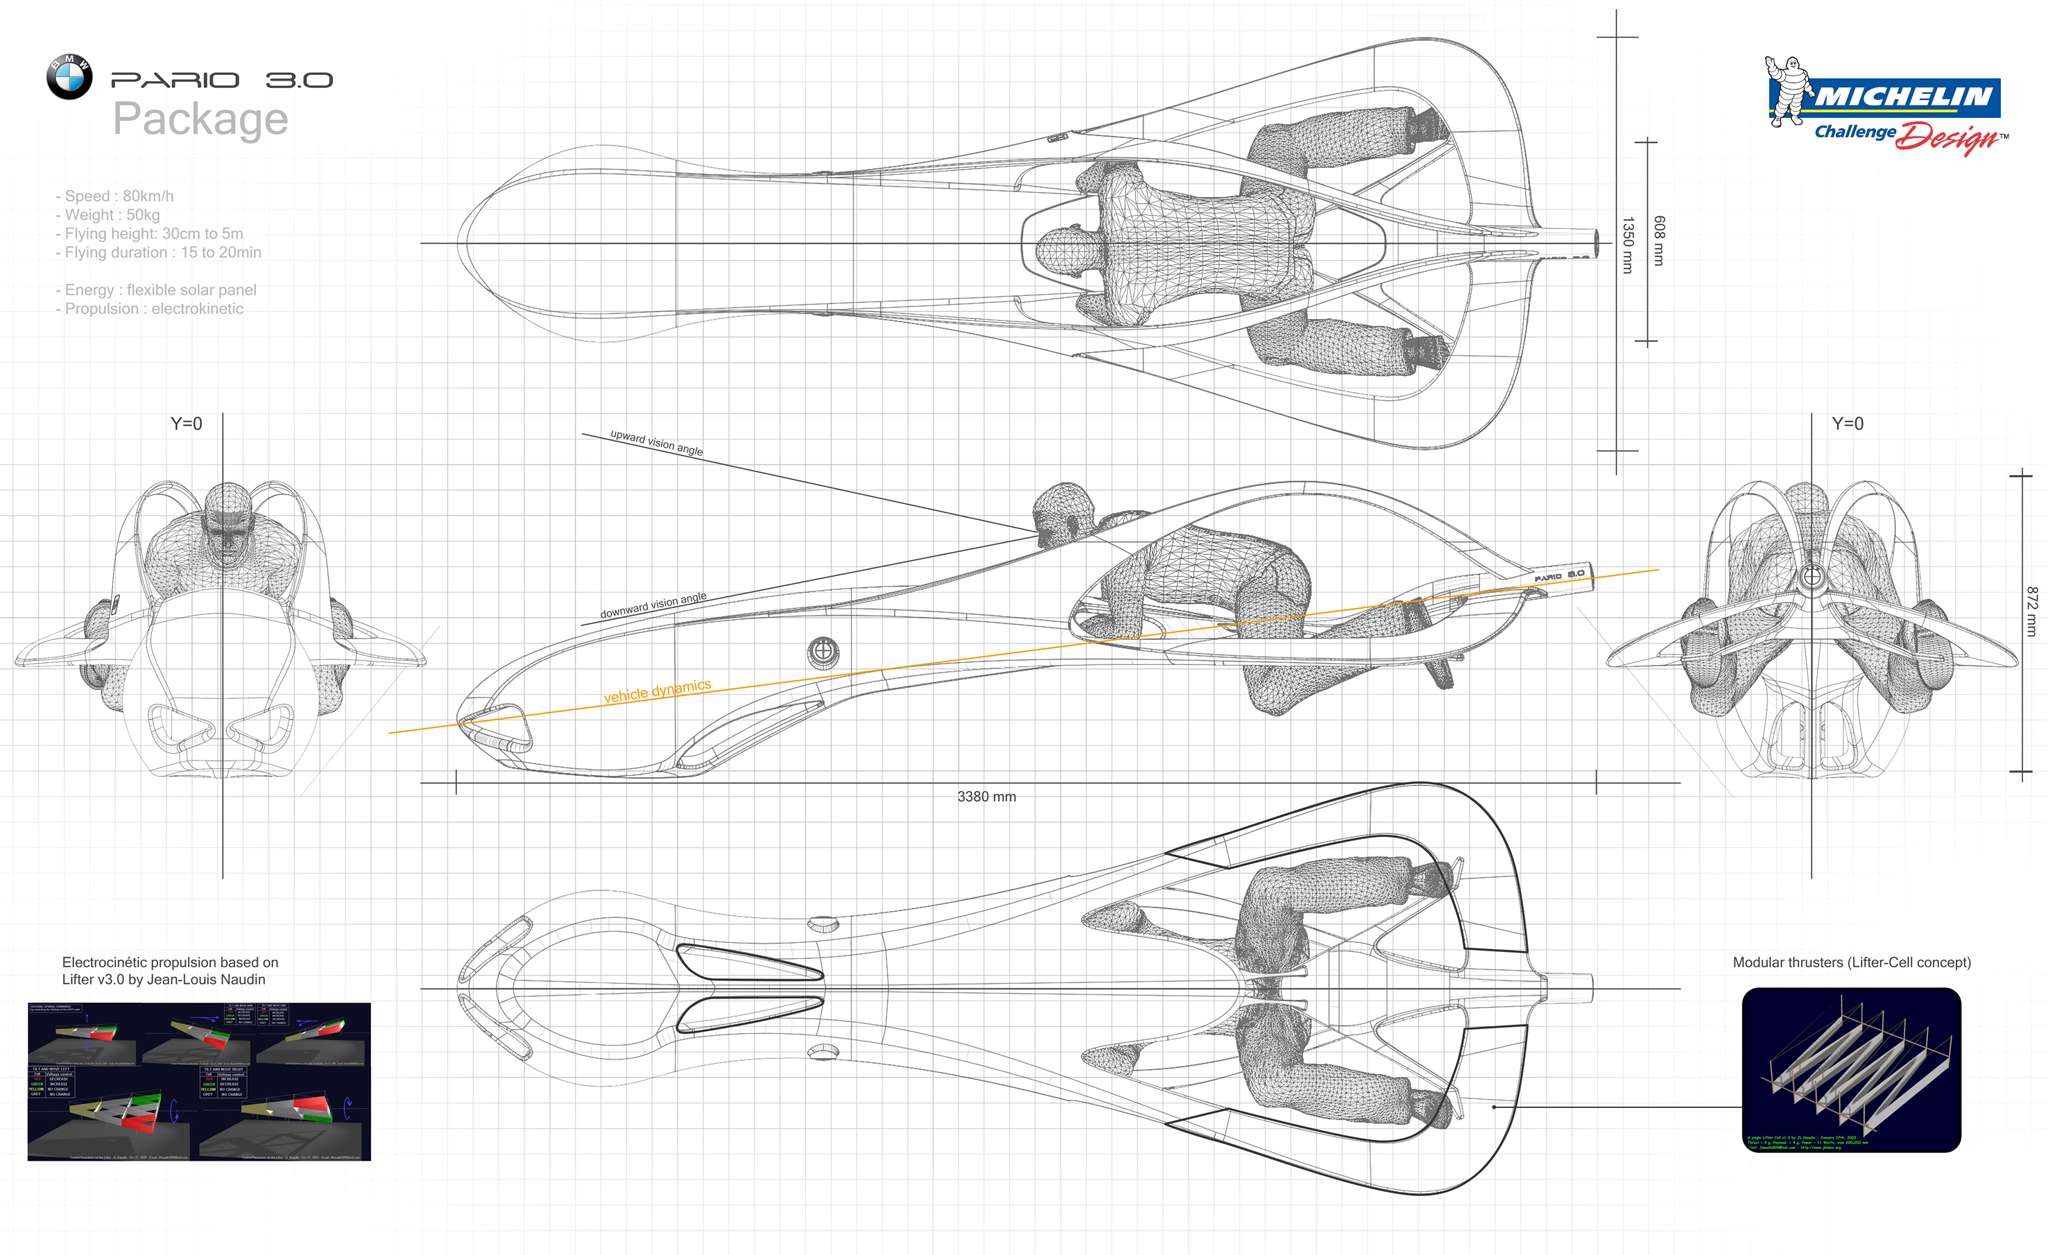 BMW Pario 30 by Harvey Rabenjamina, France | Michelin Challenge Design